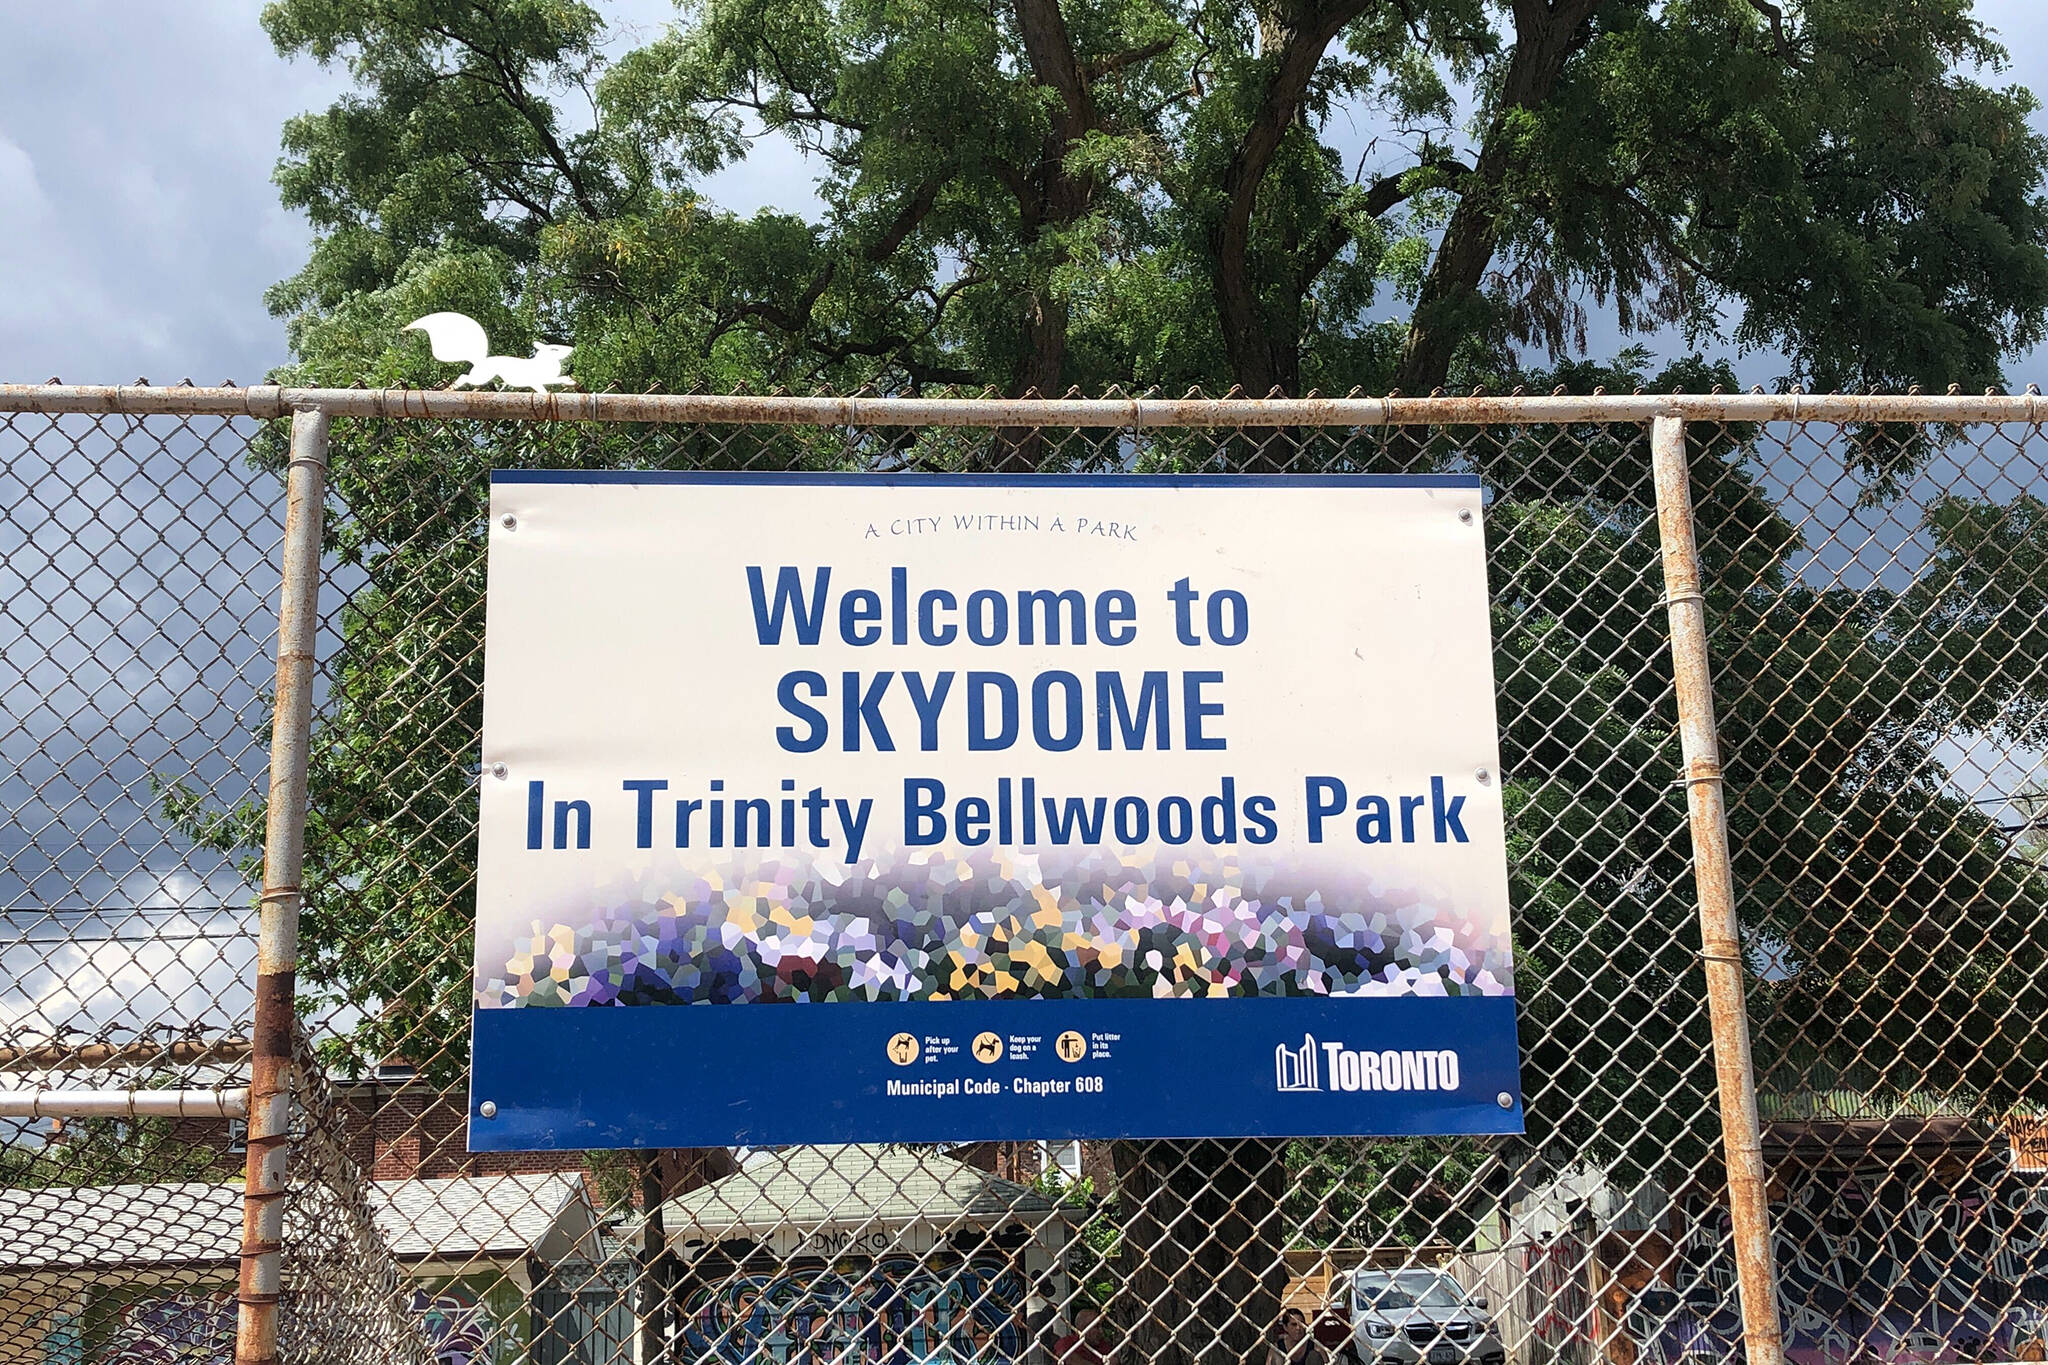 trinity bellwoods skydome